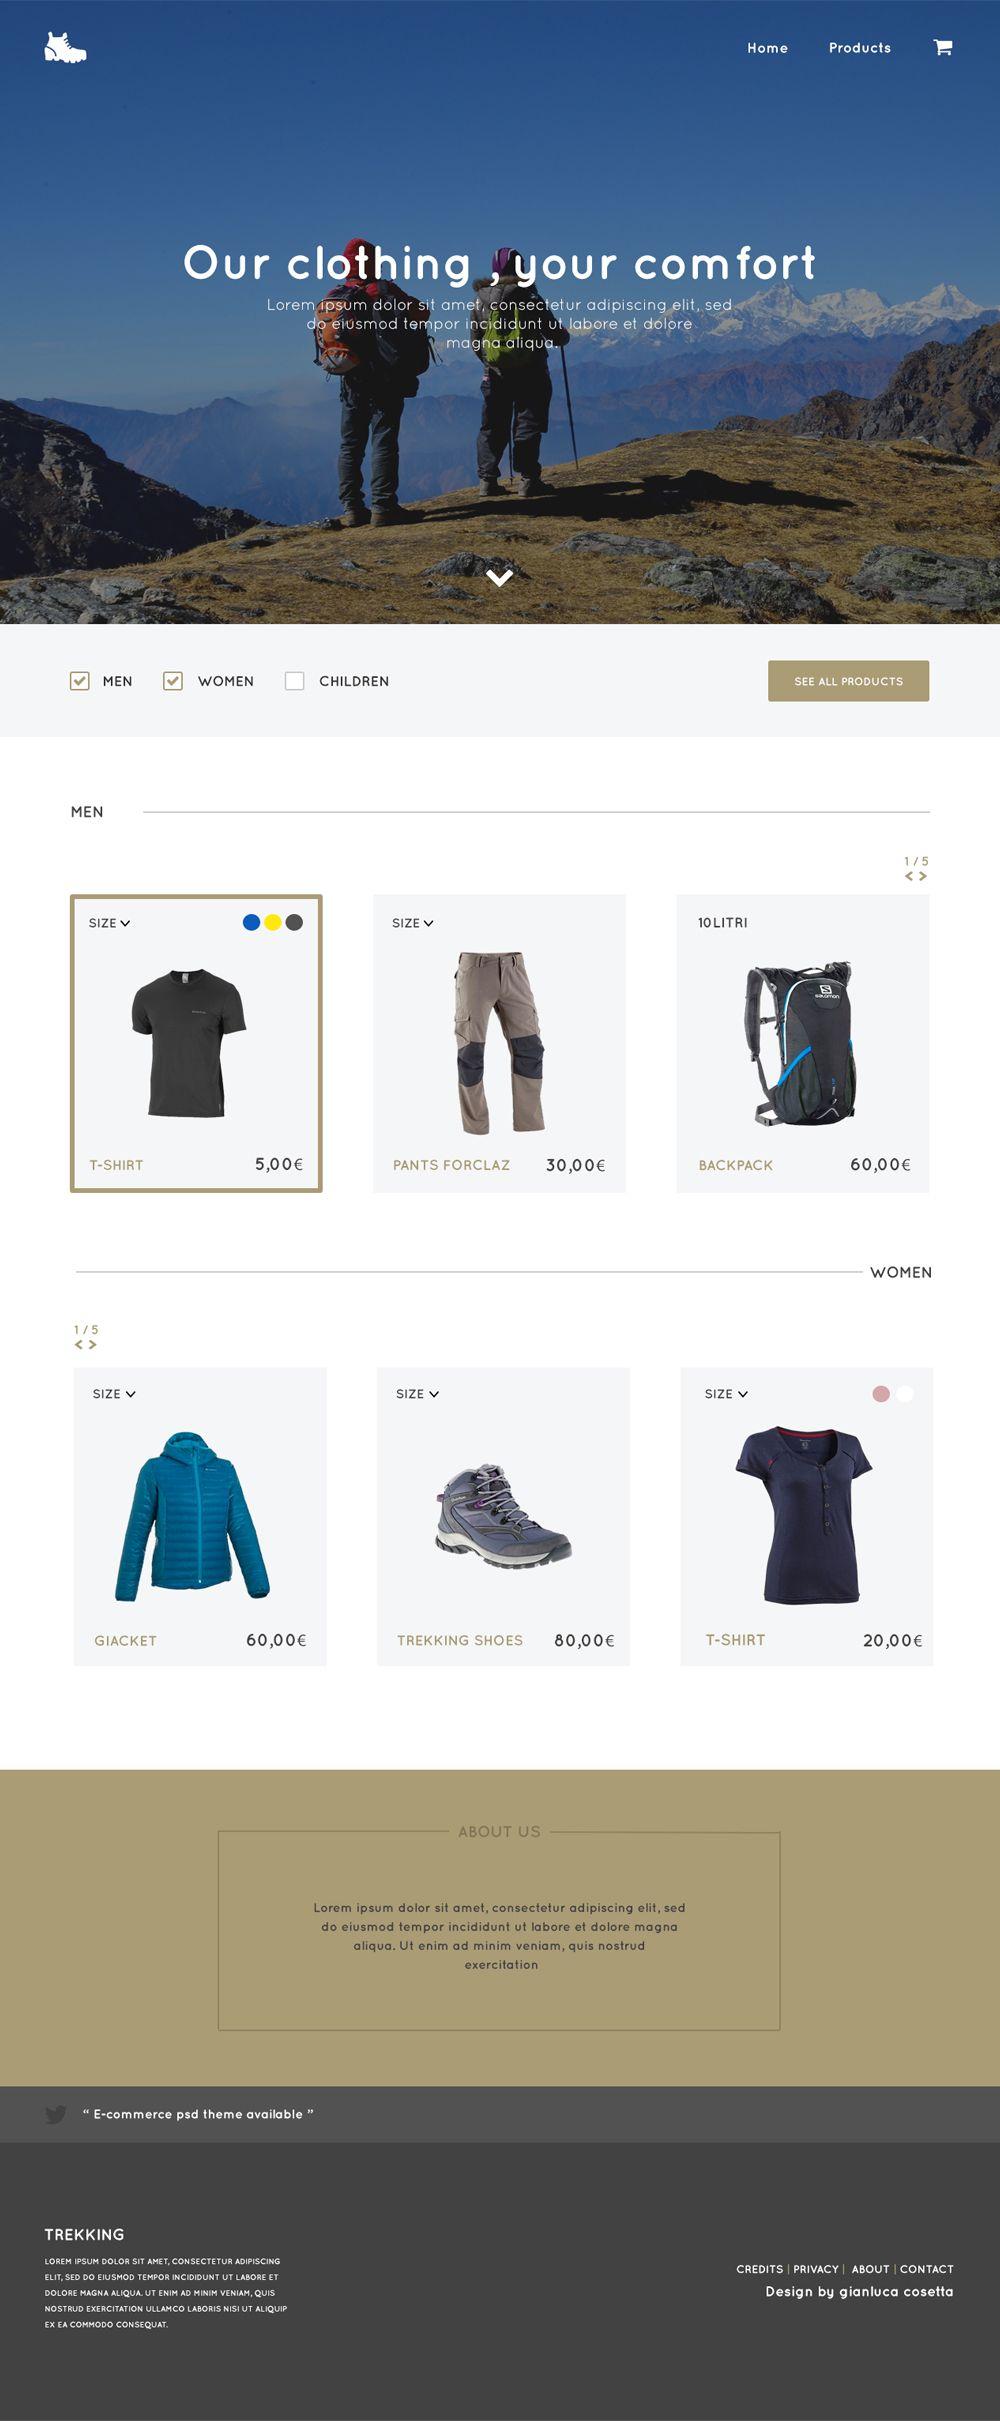 Trekking Store - Free E Commerce Web Template PSD | Free E commerce ...